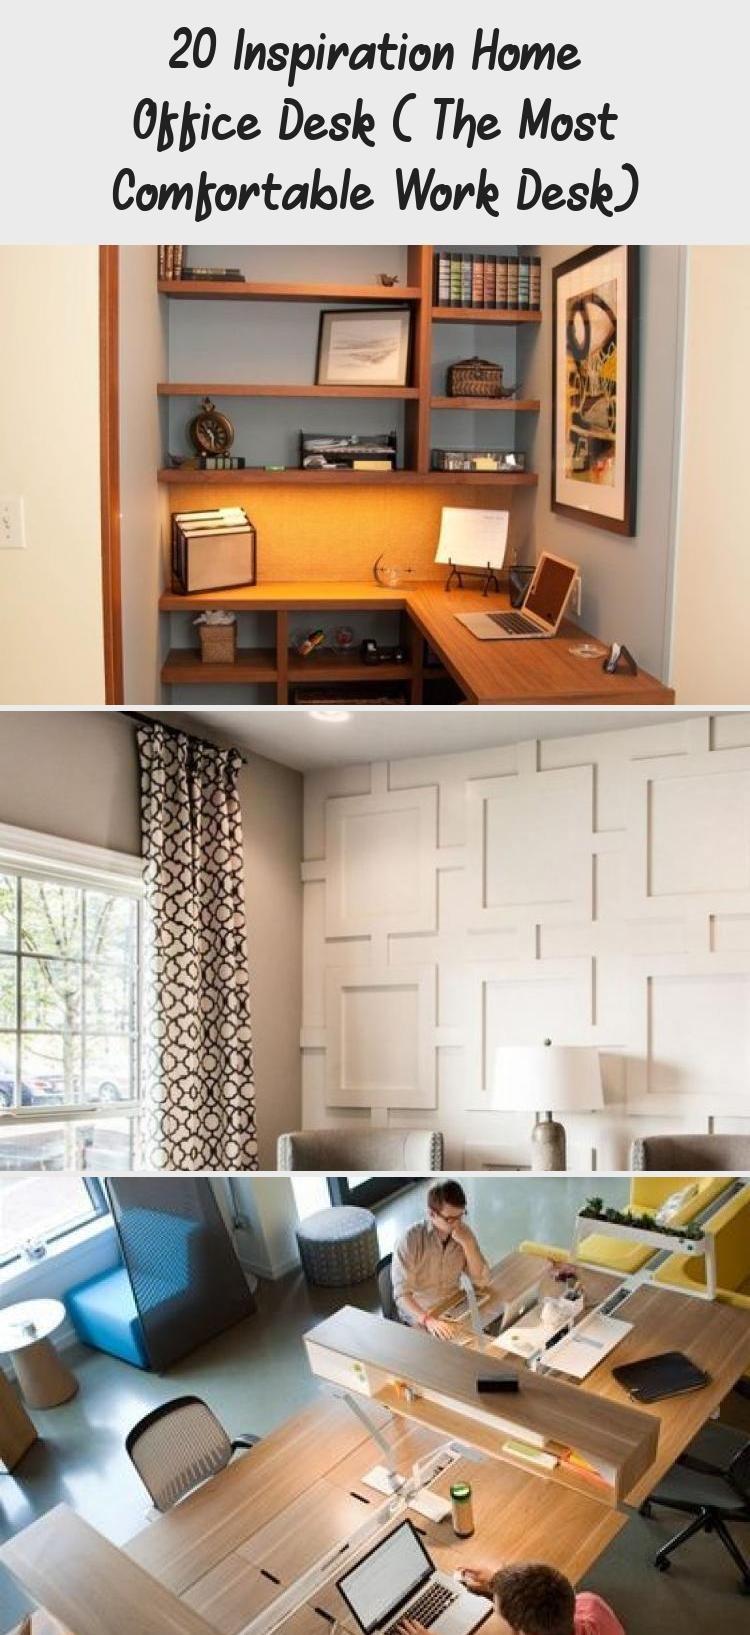 20 Inspiration Home Office Desk The Most Comfortable Work Desk In 2020 Shabby Chic Office Desk Minimalist Desk Design Apartment Decor